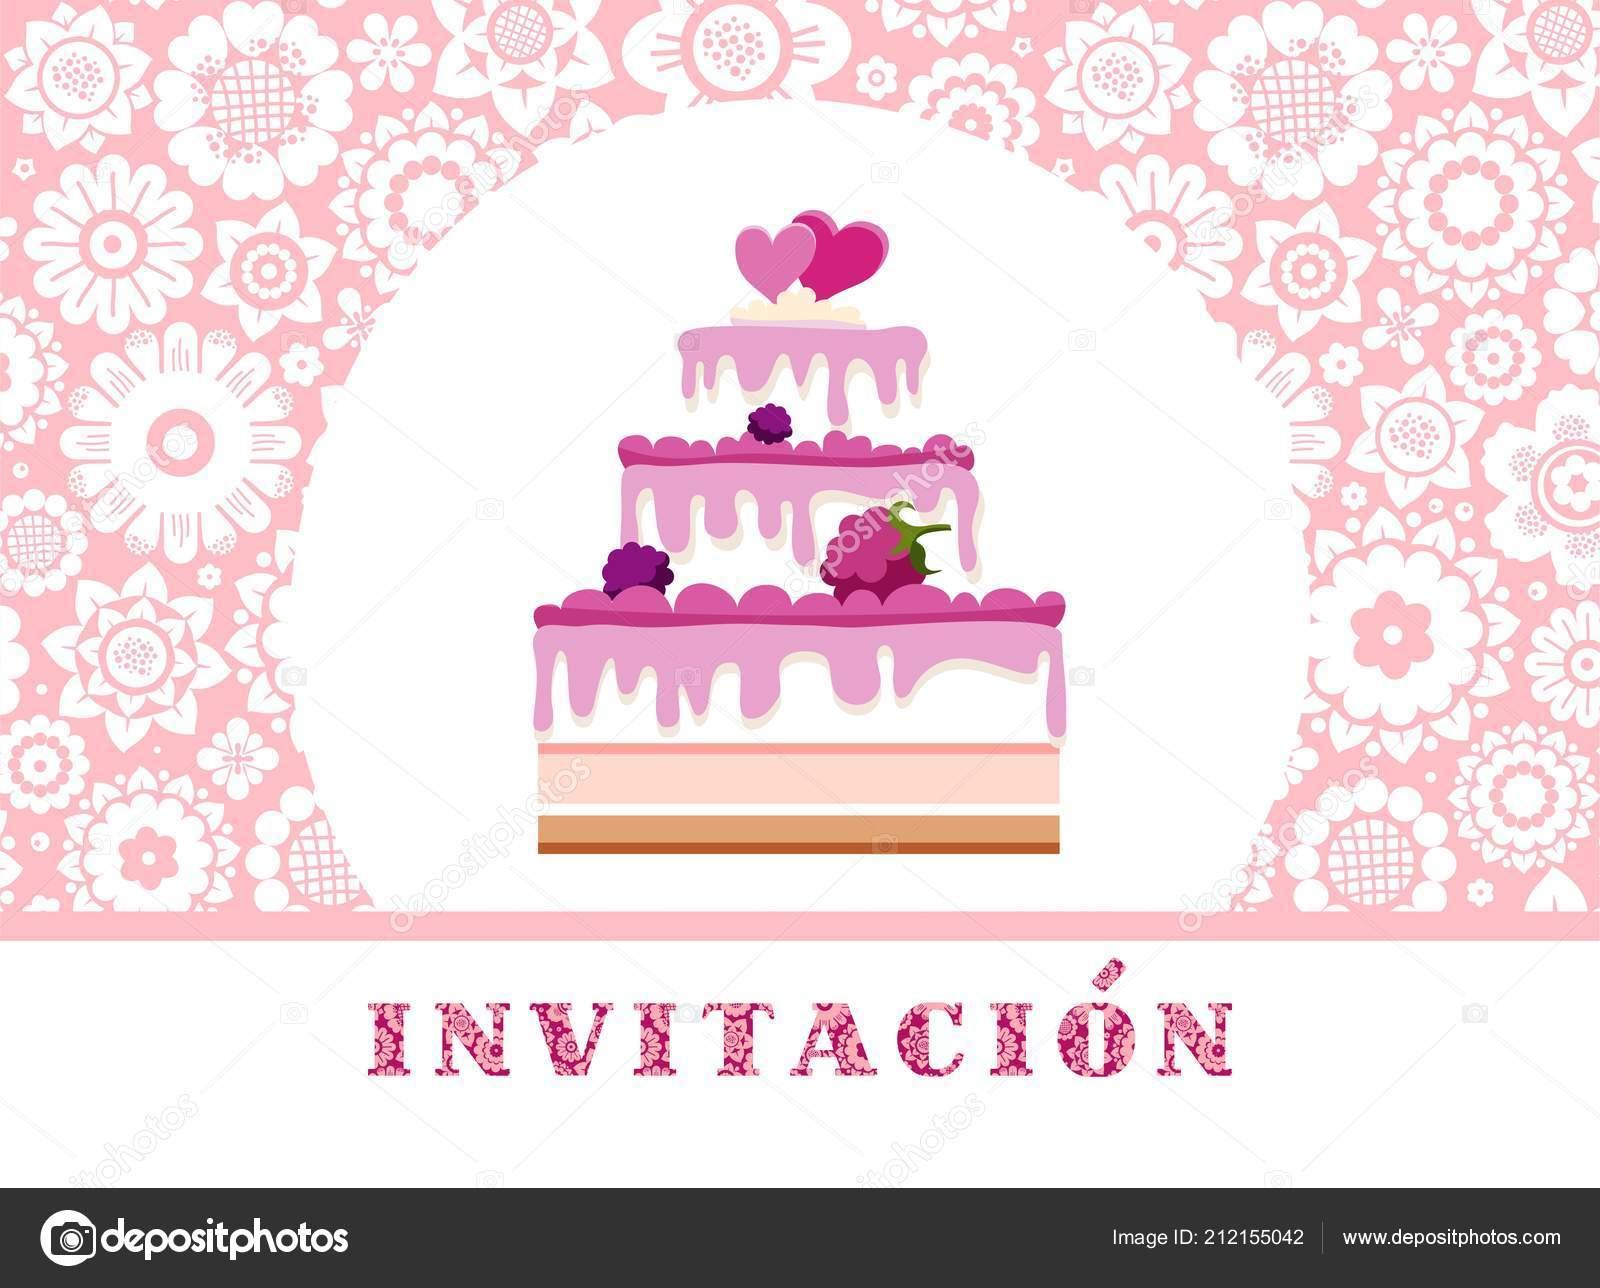 Invitation celebration berry cake spanish pink floral vector color invitation to celebration berry cake spanish pink floral vector color card invitation to a holiday event celebration the inscription in spanish stopboris Images